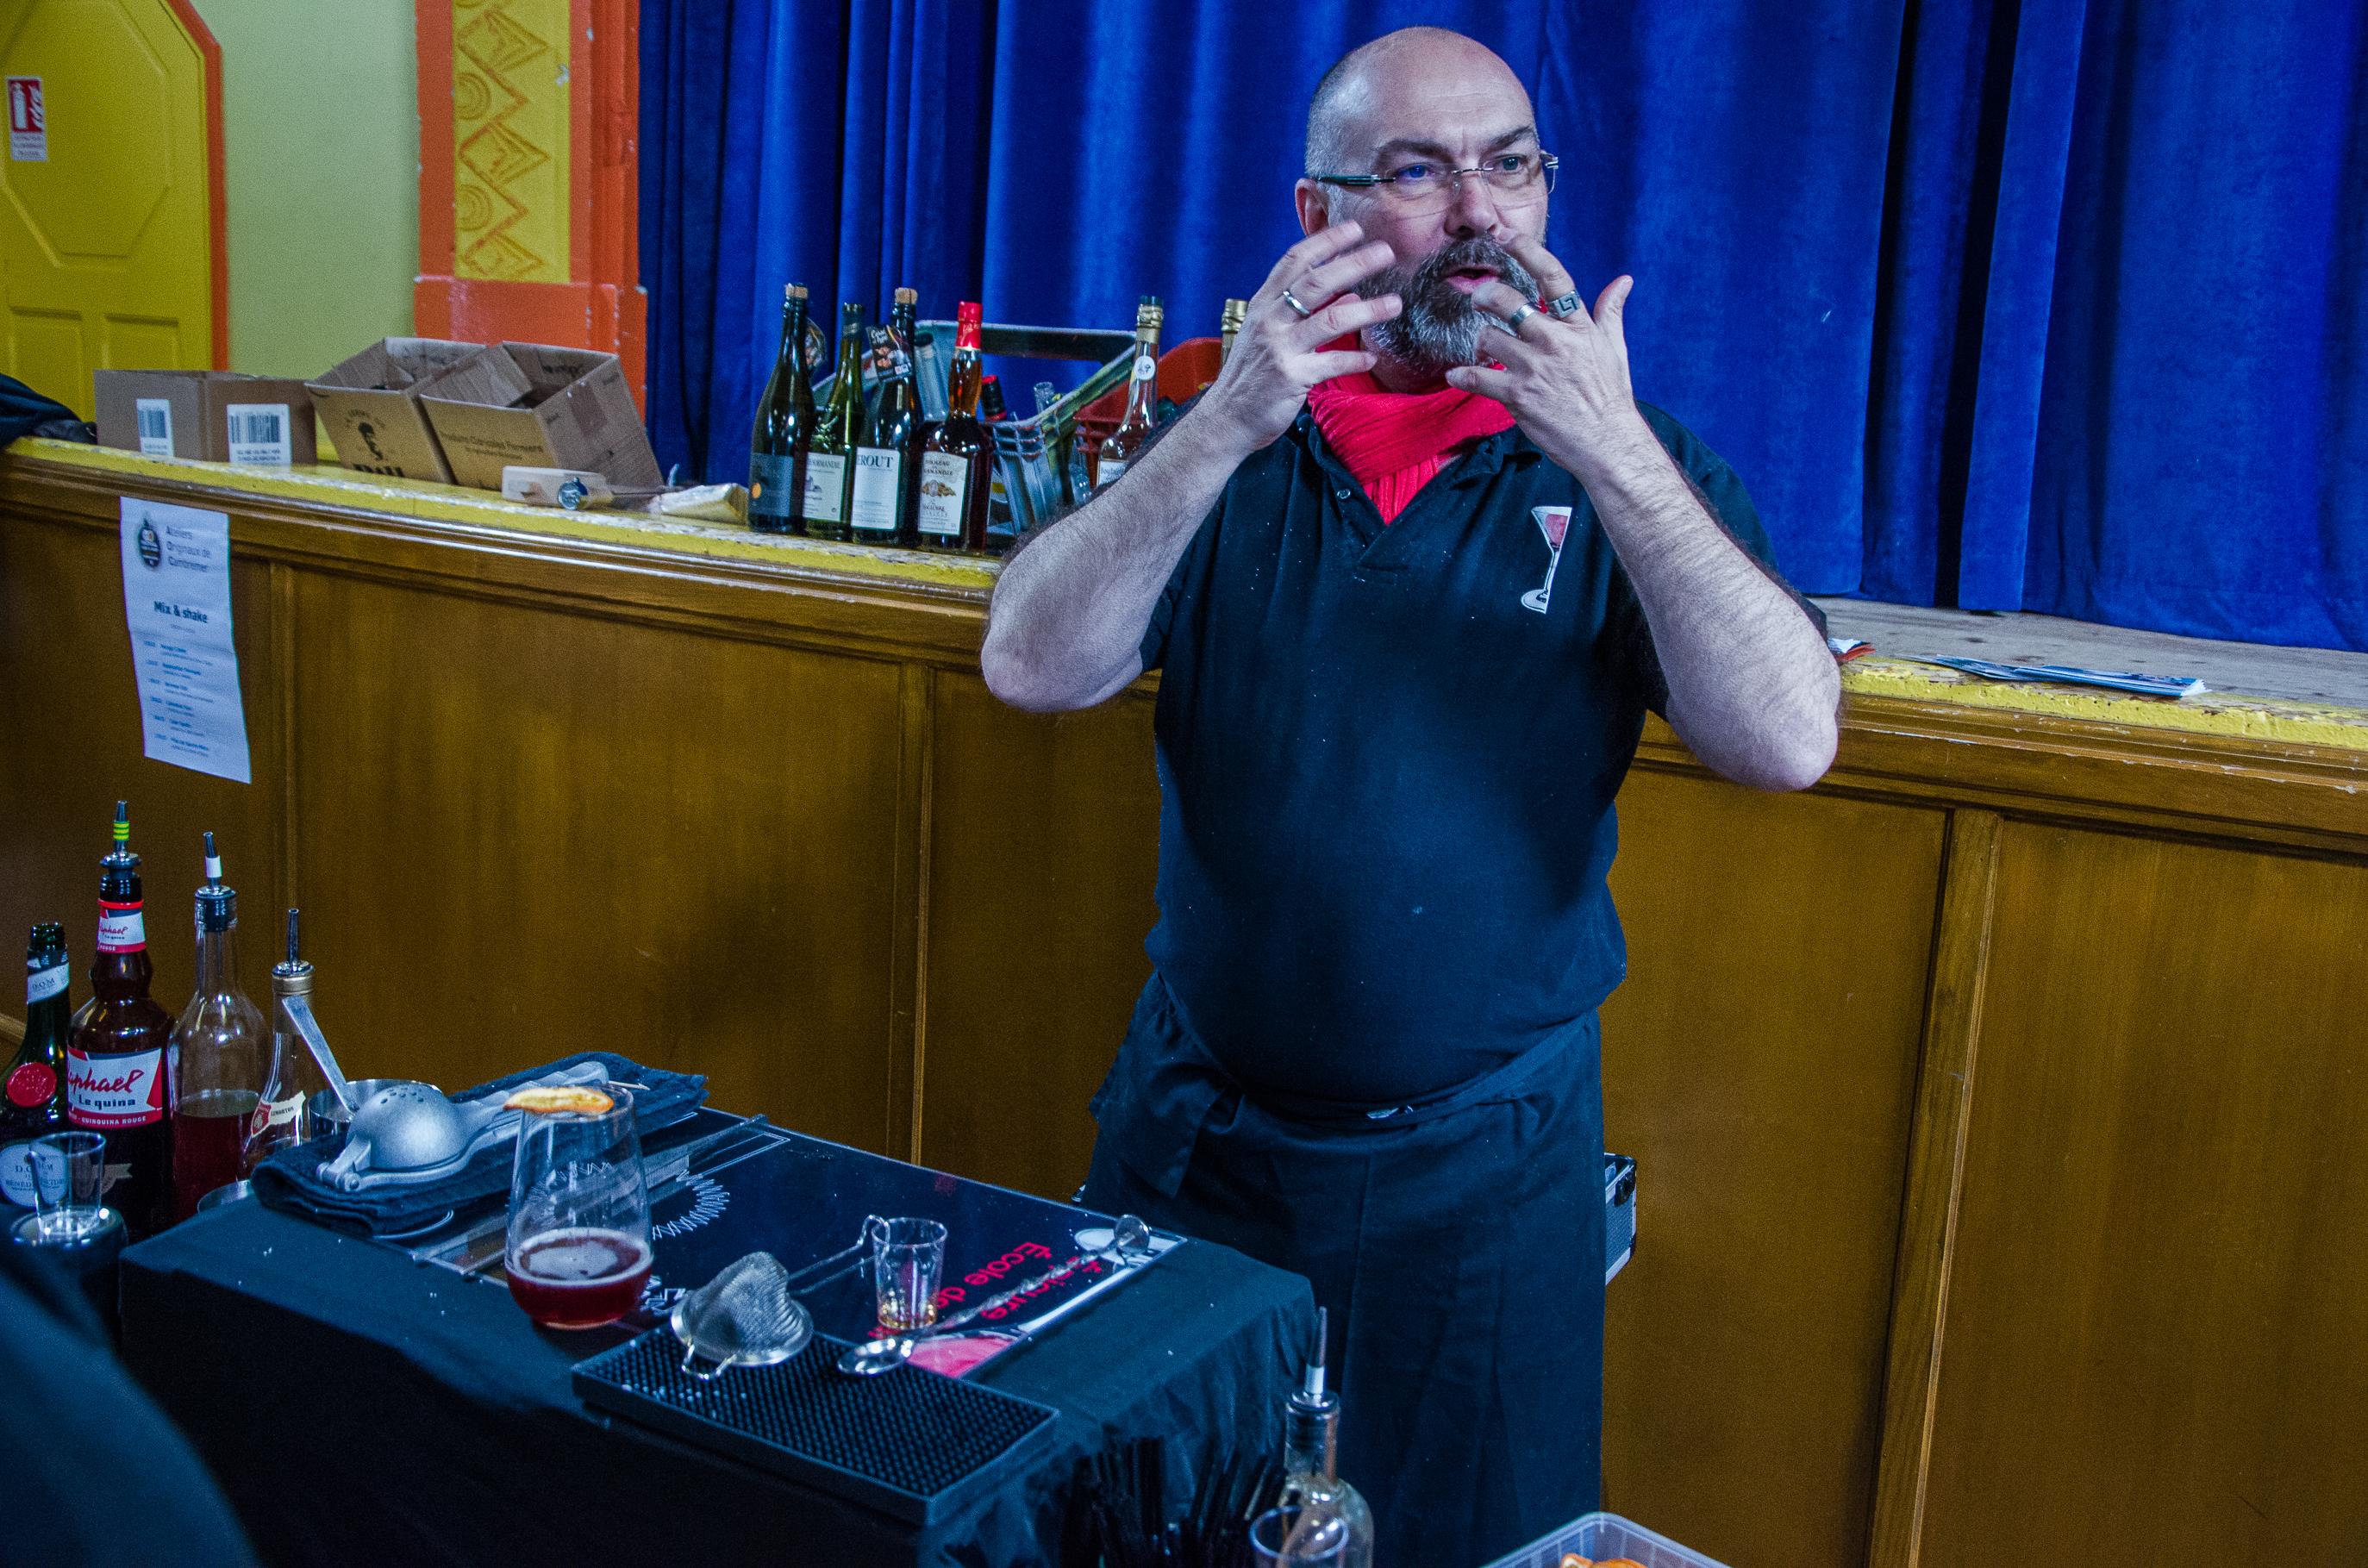 AOC Cambremer atelier cocktail